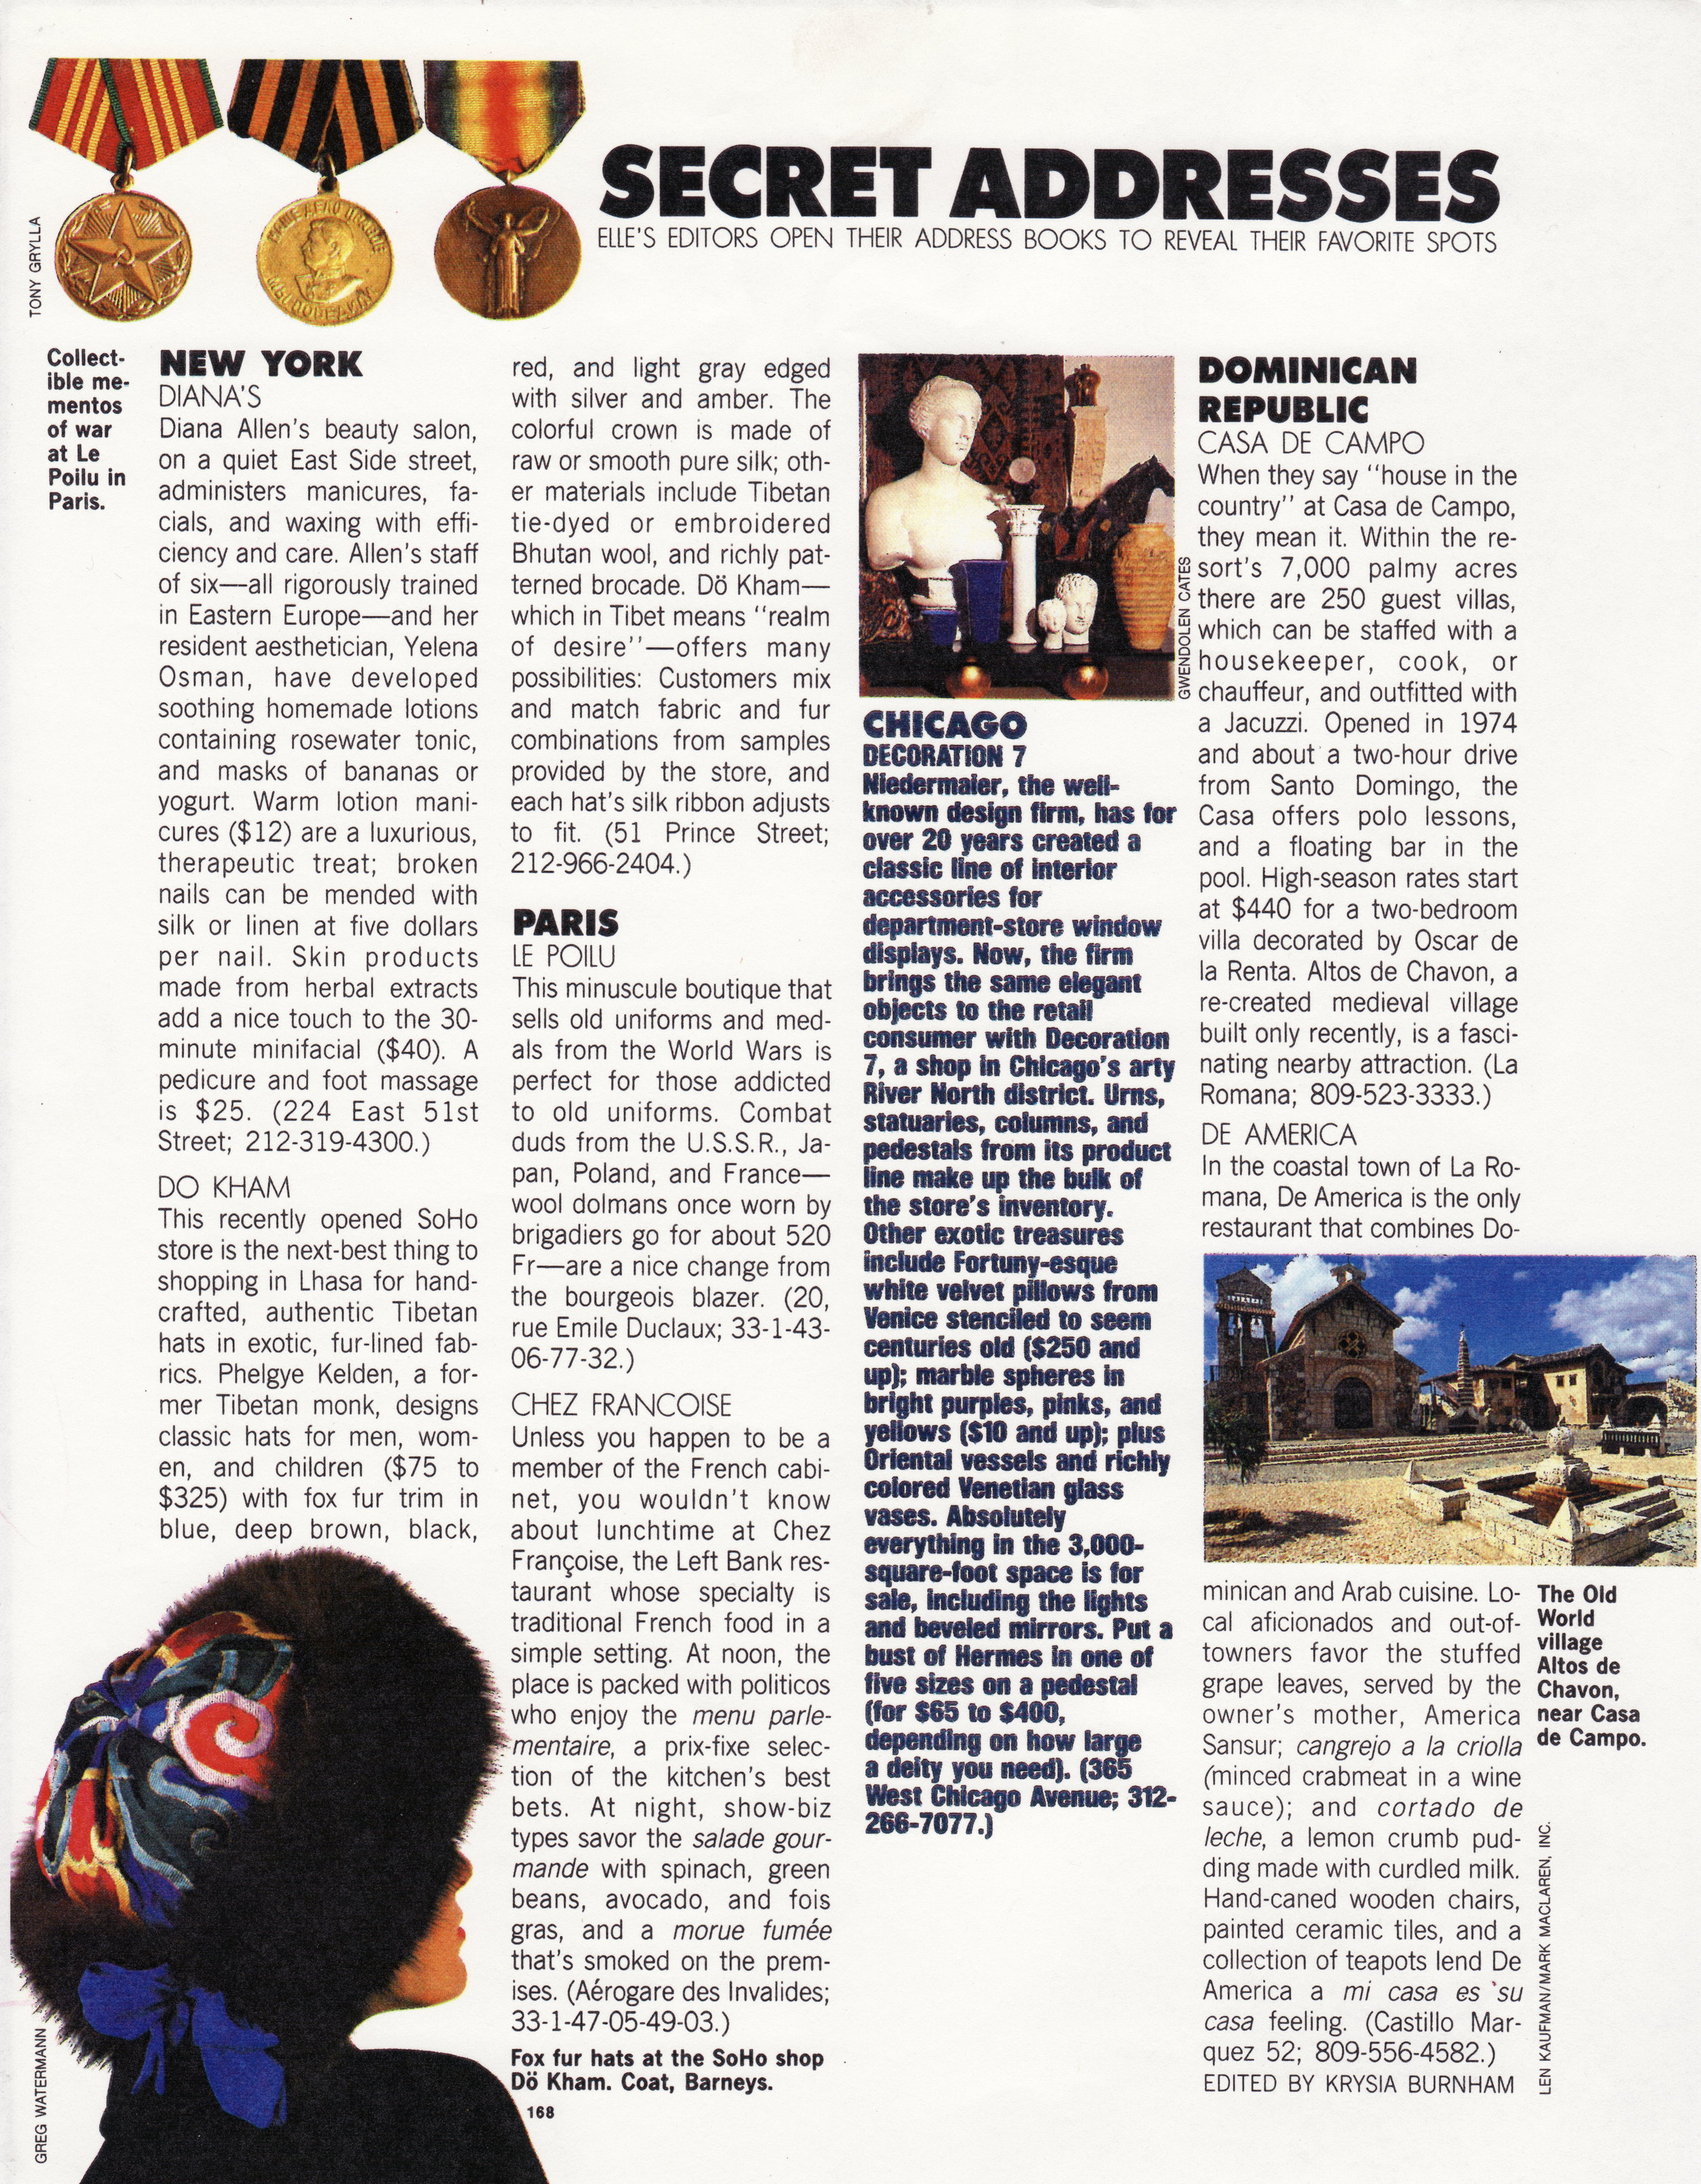 Elle Magazine - Featured as a Secret Address in Elle Magazine